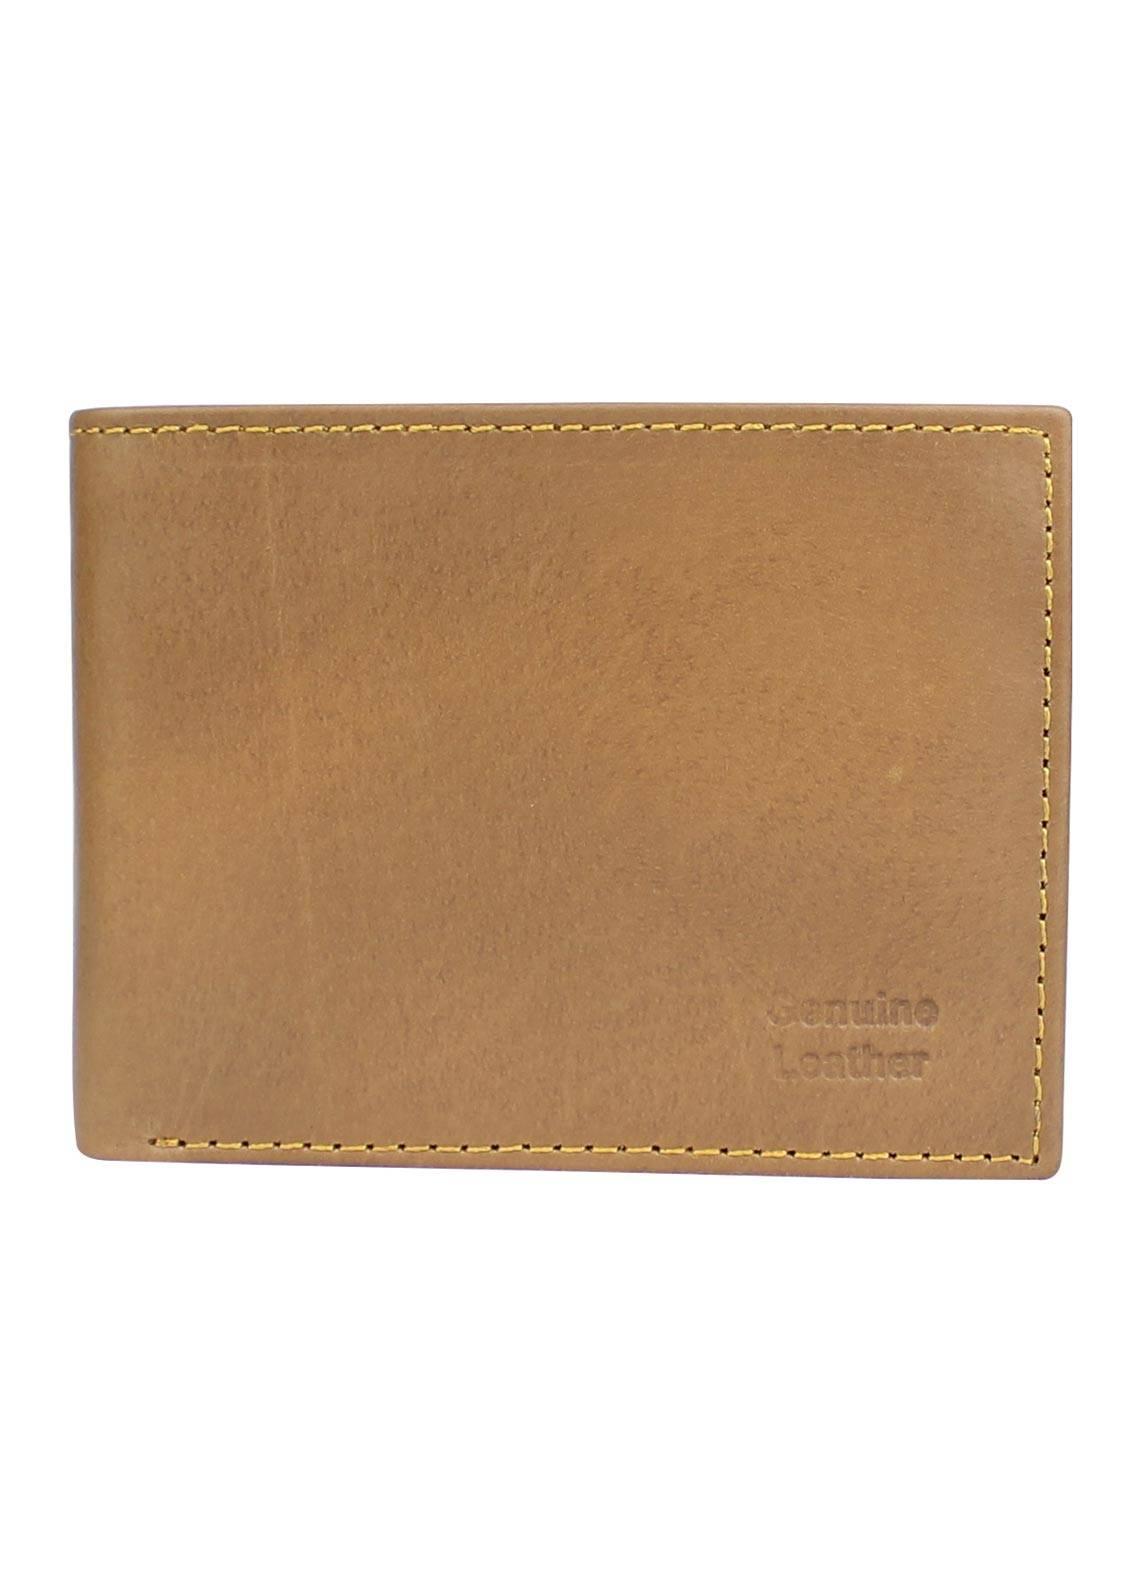 Shahzeb Saeed Plain Texture Leather  Wallet W-067 - Men's Accessories